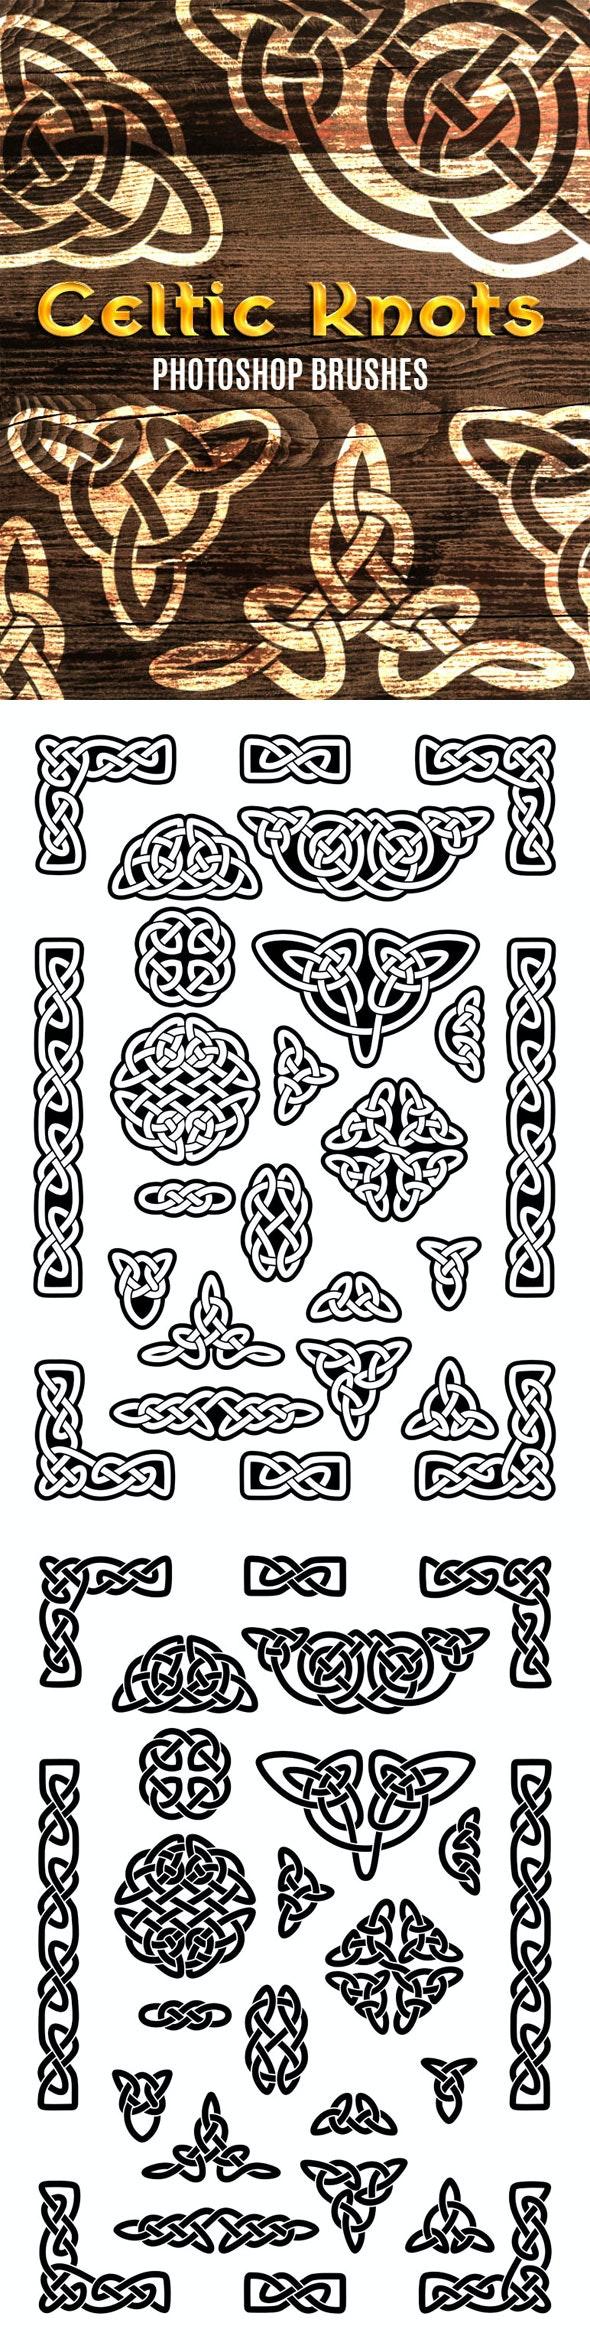 Celtic Brushes - Miscellaneous Brushes